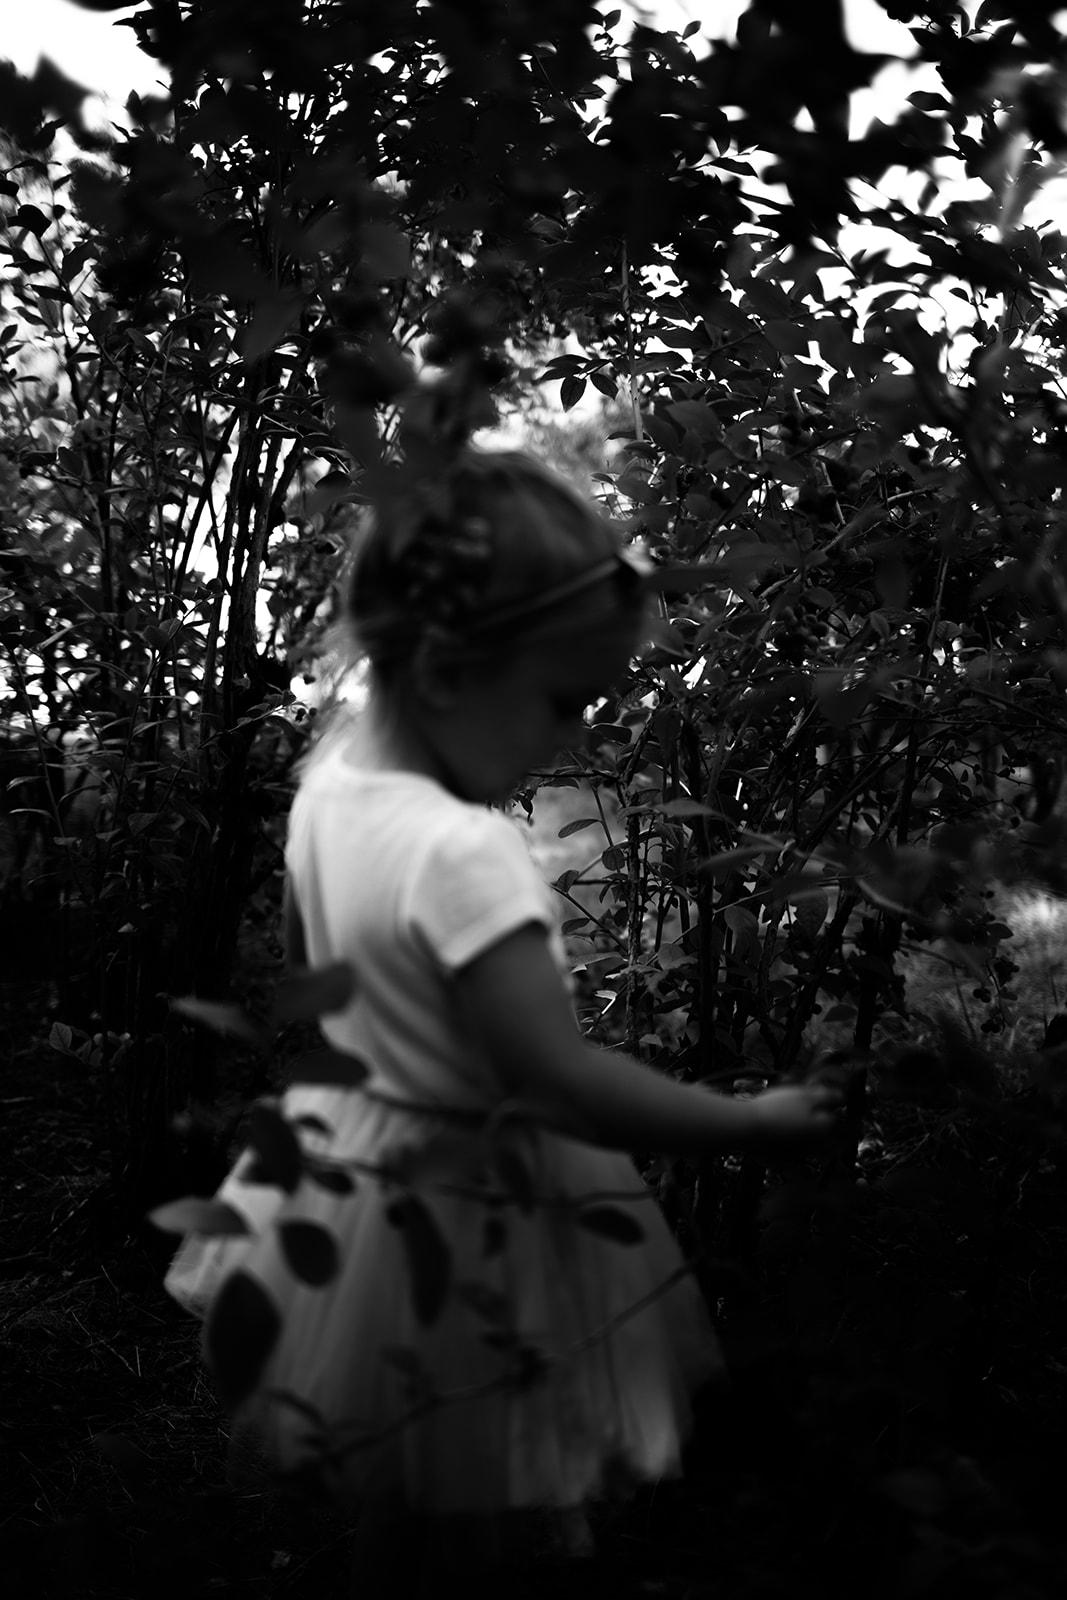 Hazel+Three+008.jpg